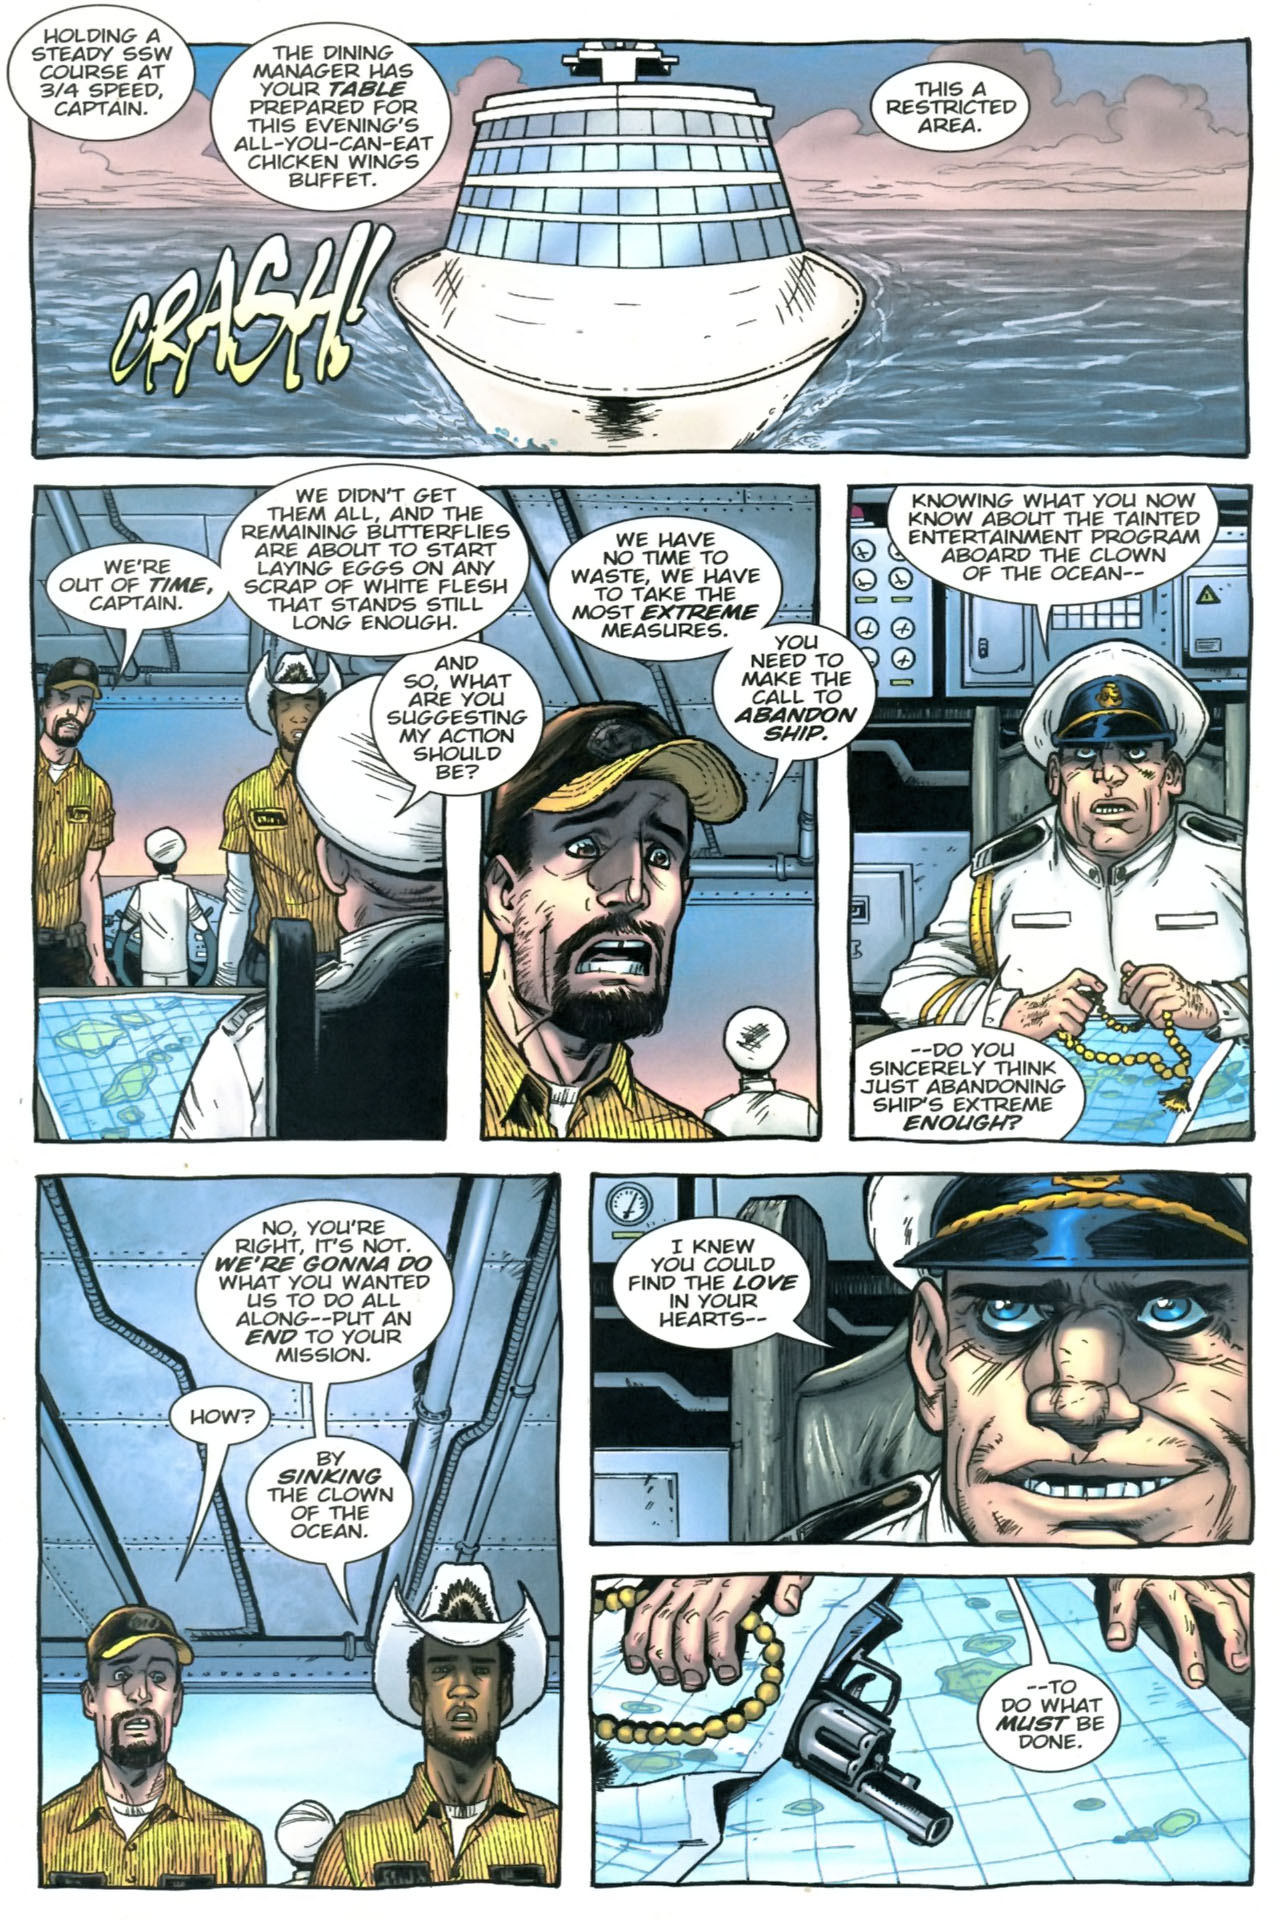 Read online The Exterminators comic -  Issue #24 - 19